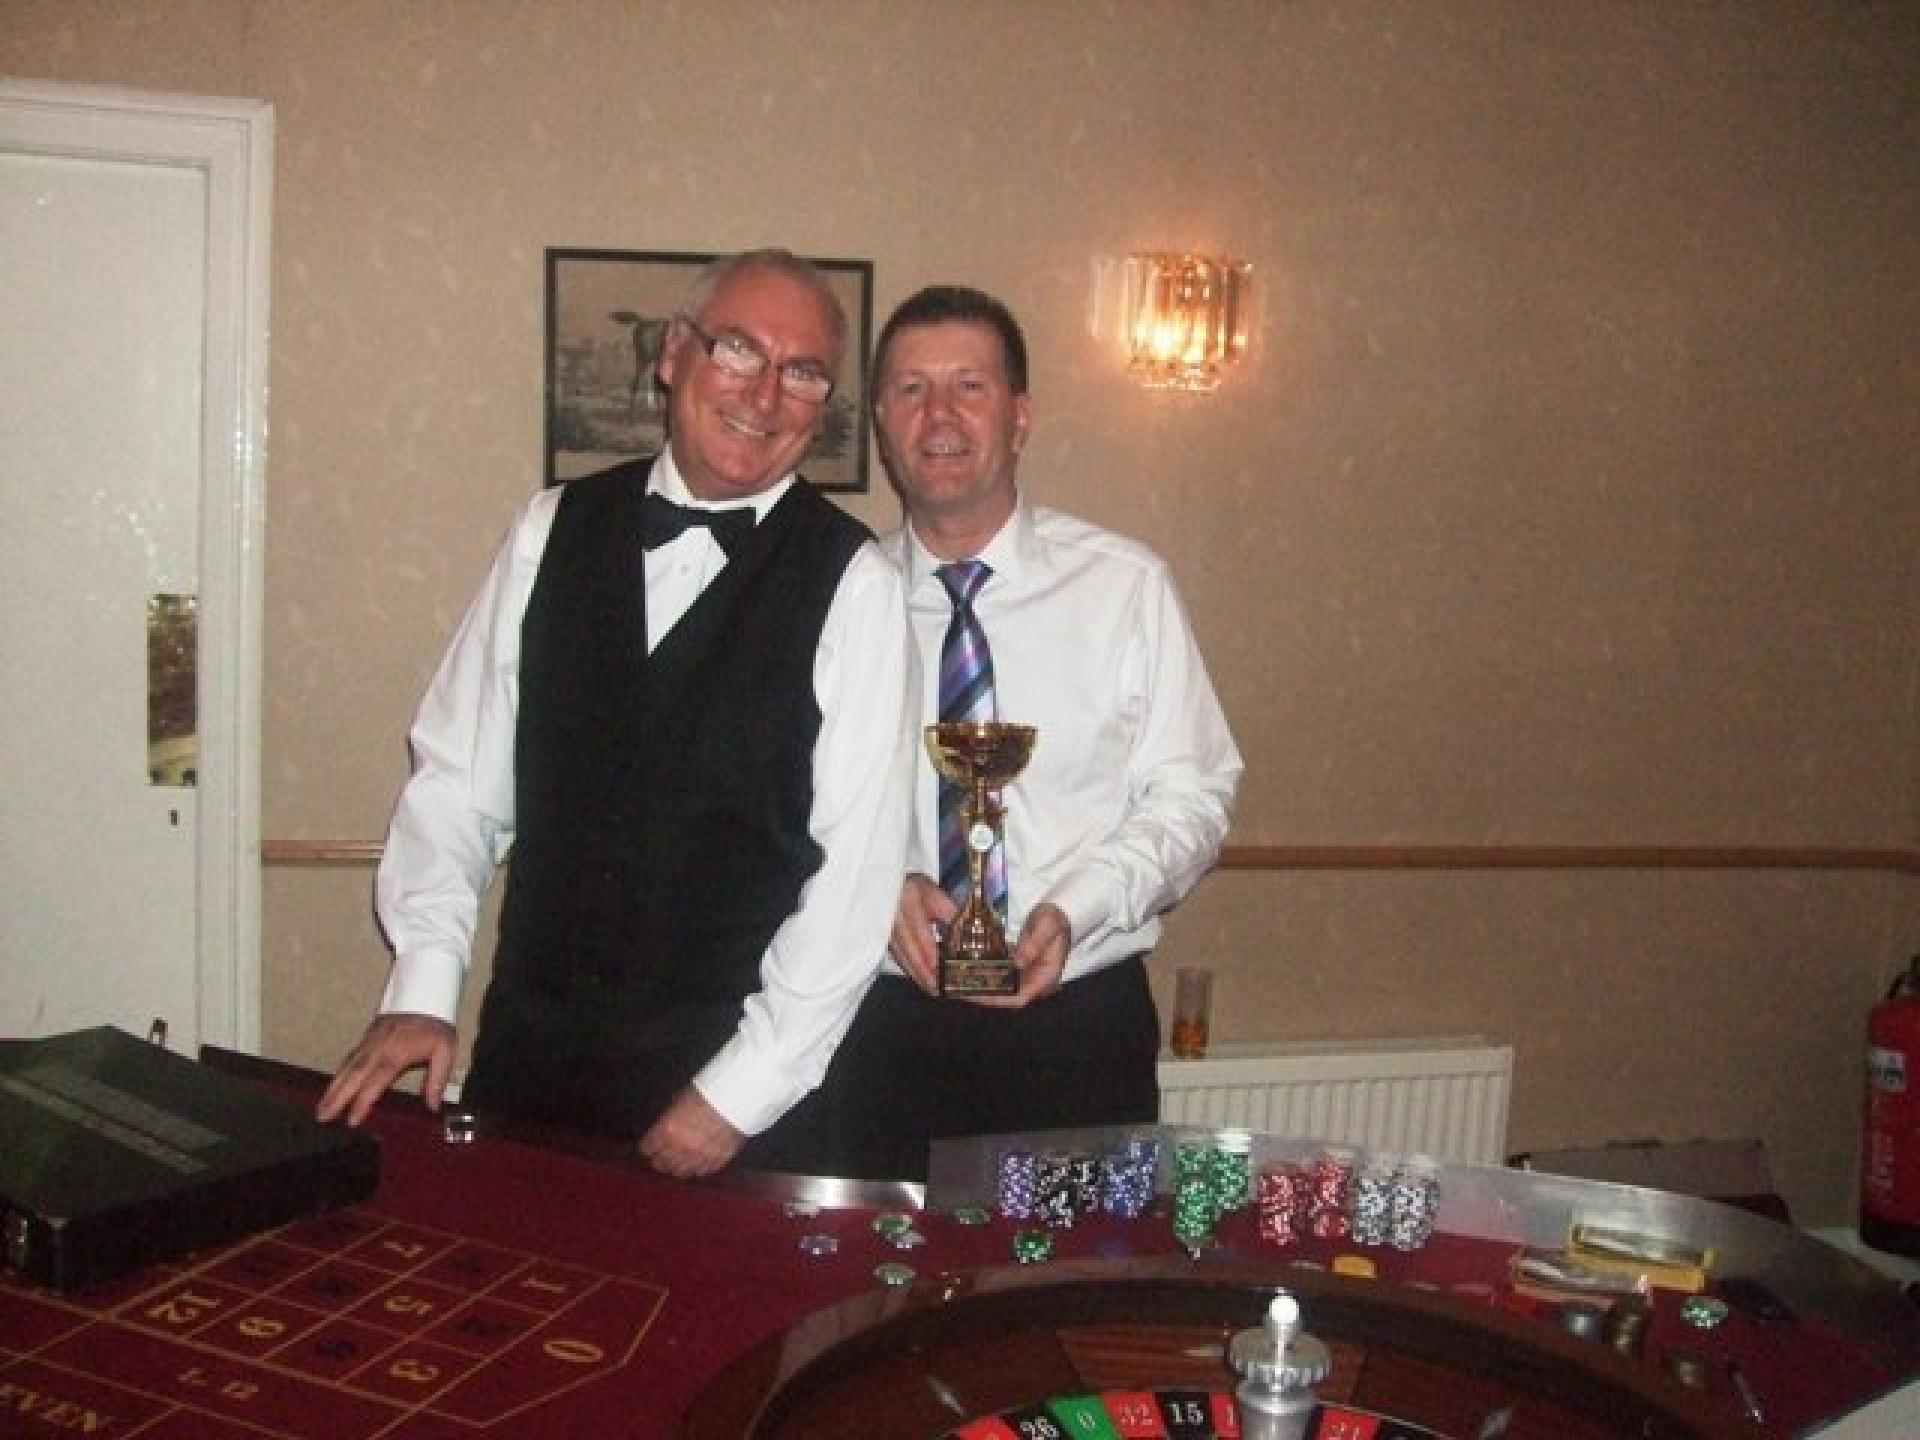 WEB Fun Casino Night Evening Entertainment Fife Nov 11 16